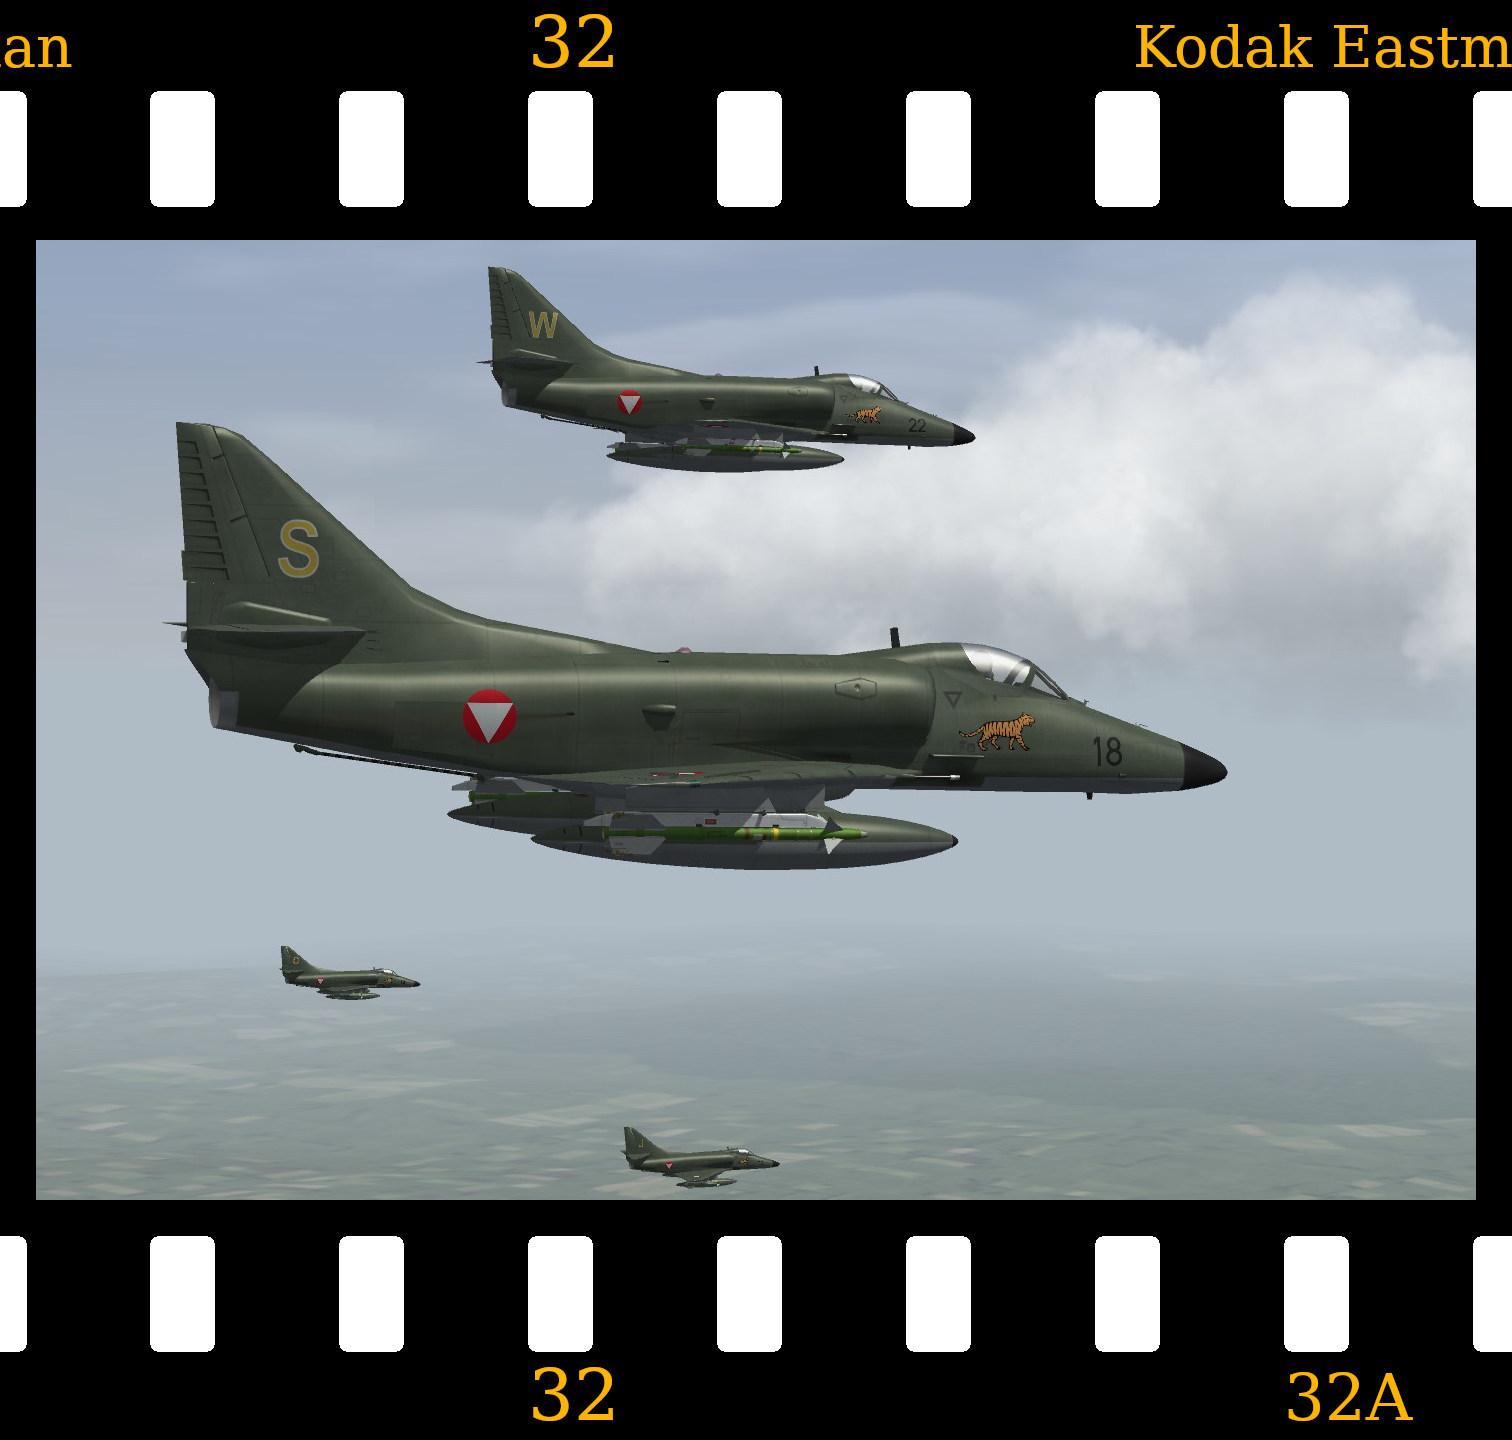 [Fictional] McDonnell Douglas A-4Ö Skyhawk